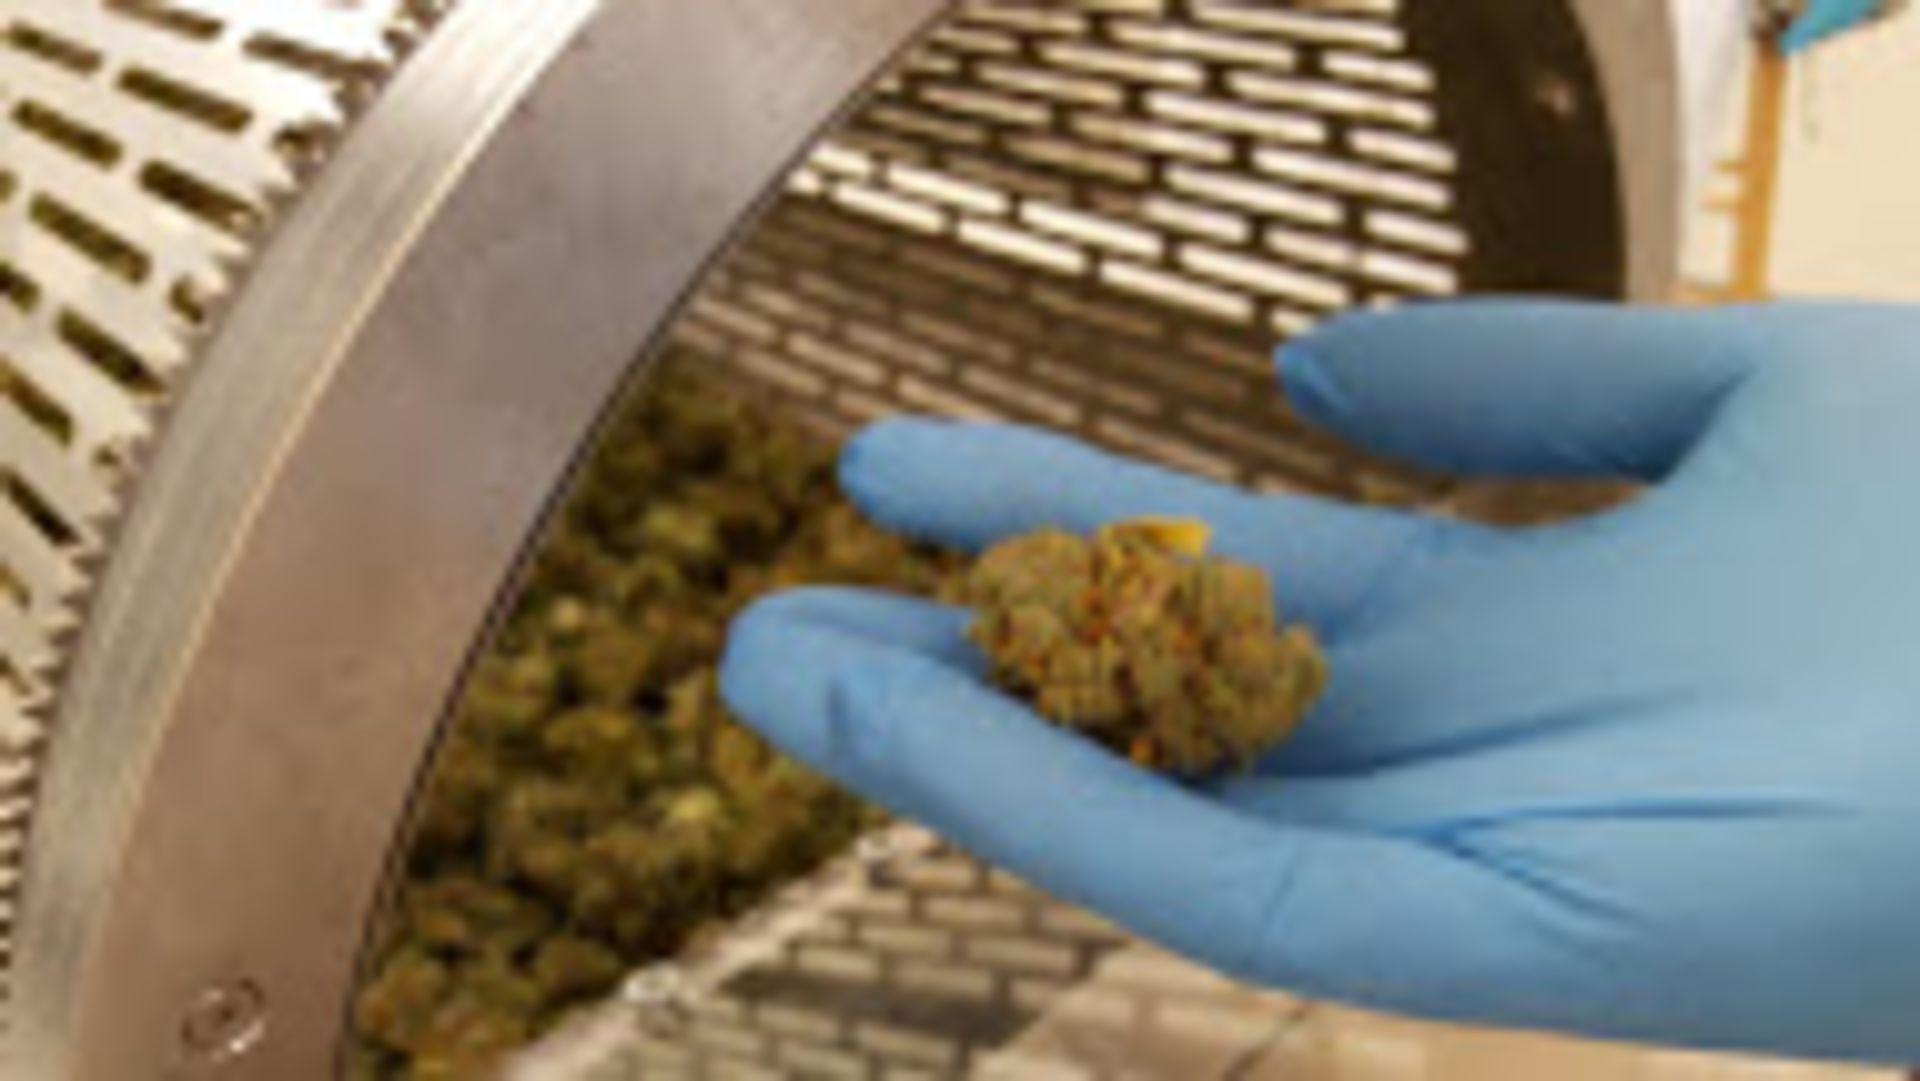 Unused/FactoryNew Revolution Cannabis & Hemp Flower Finisher System Model RDF 4300. Make $1,500/day - Image 28 of 32